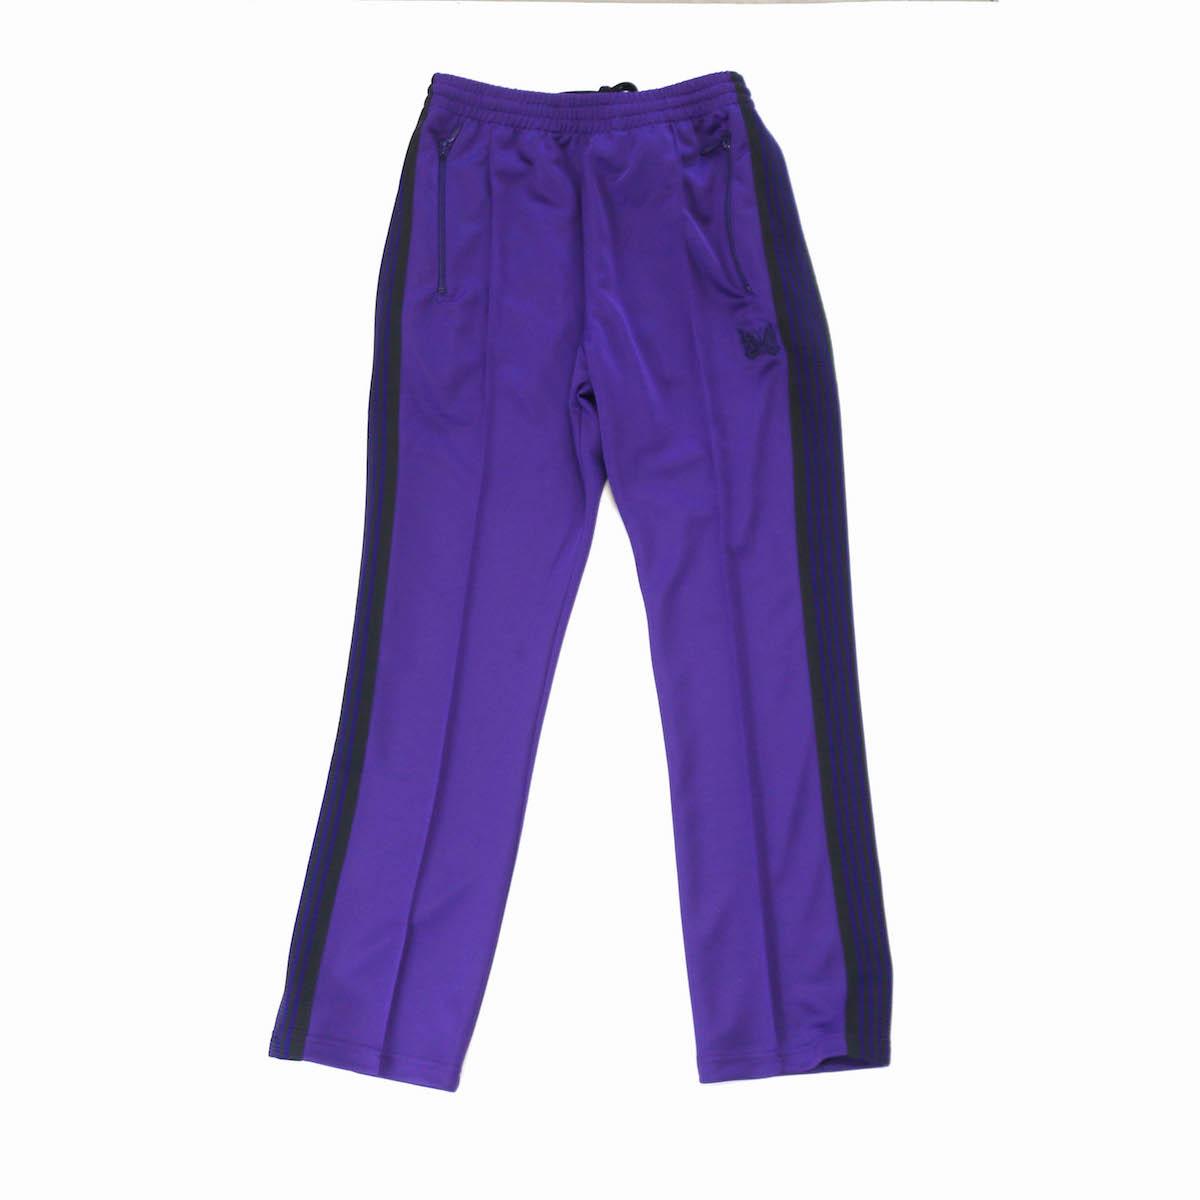 NEEDLES / NARROW TRACK PANTS -PURPLE